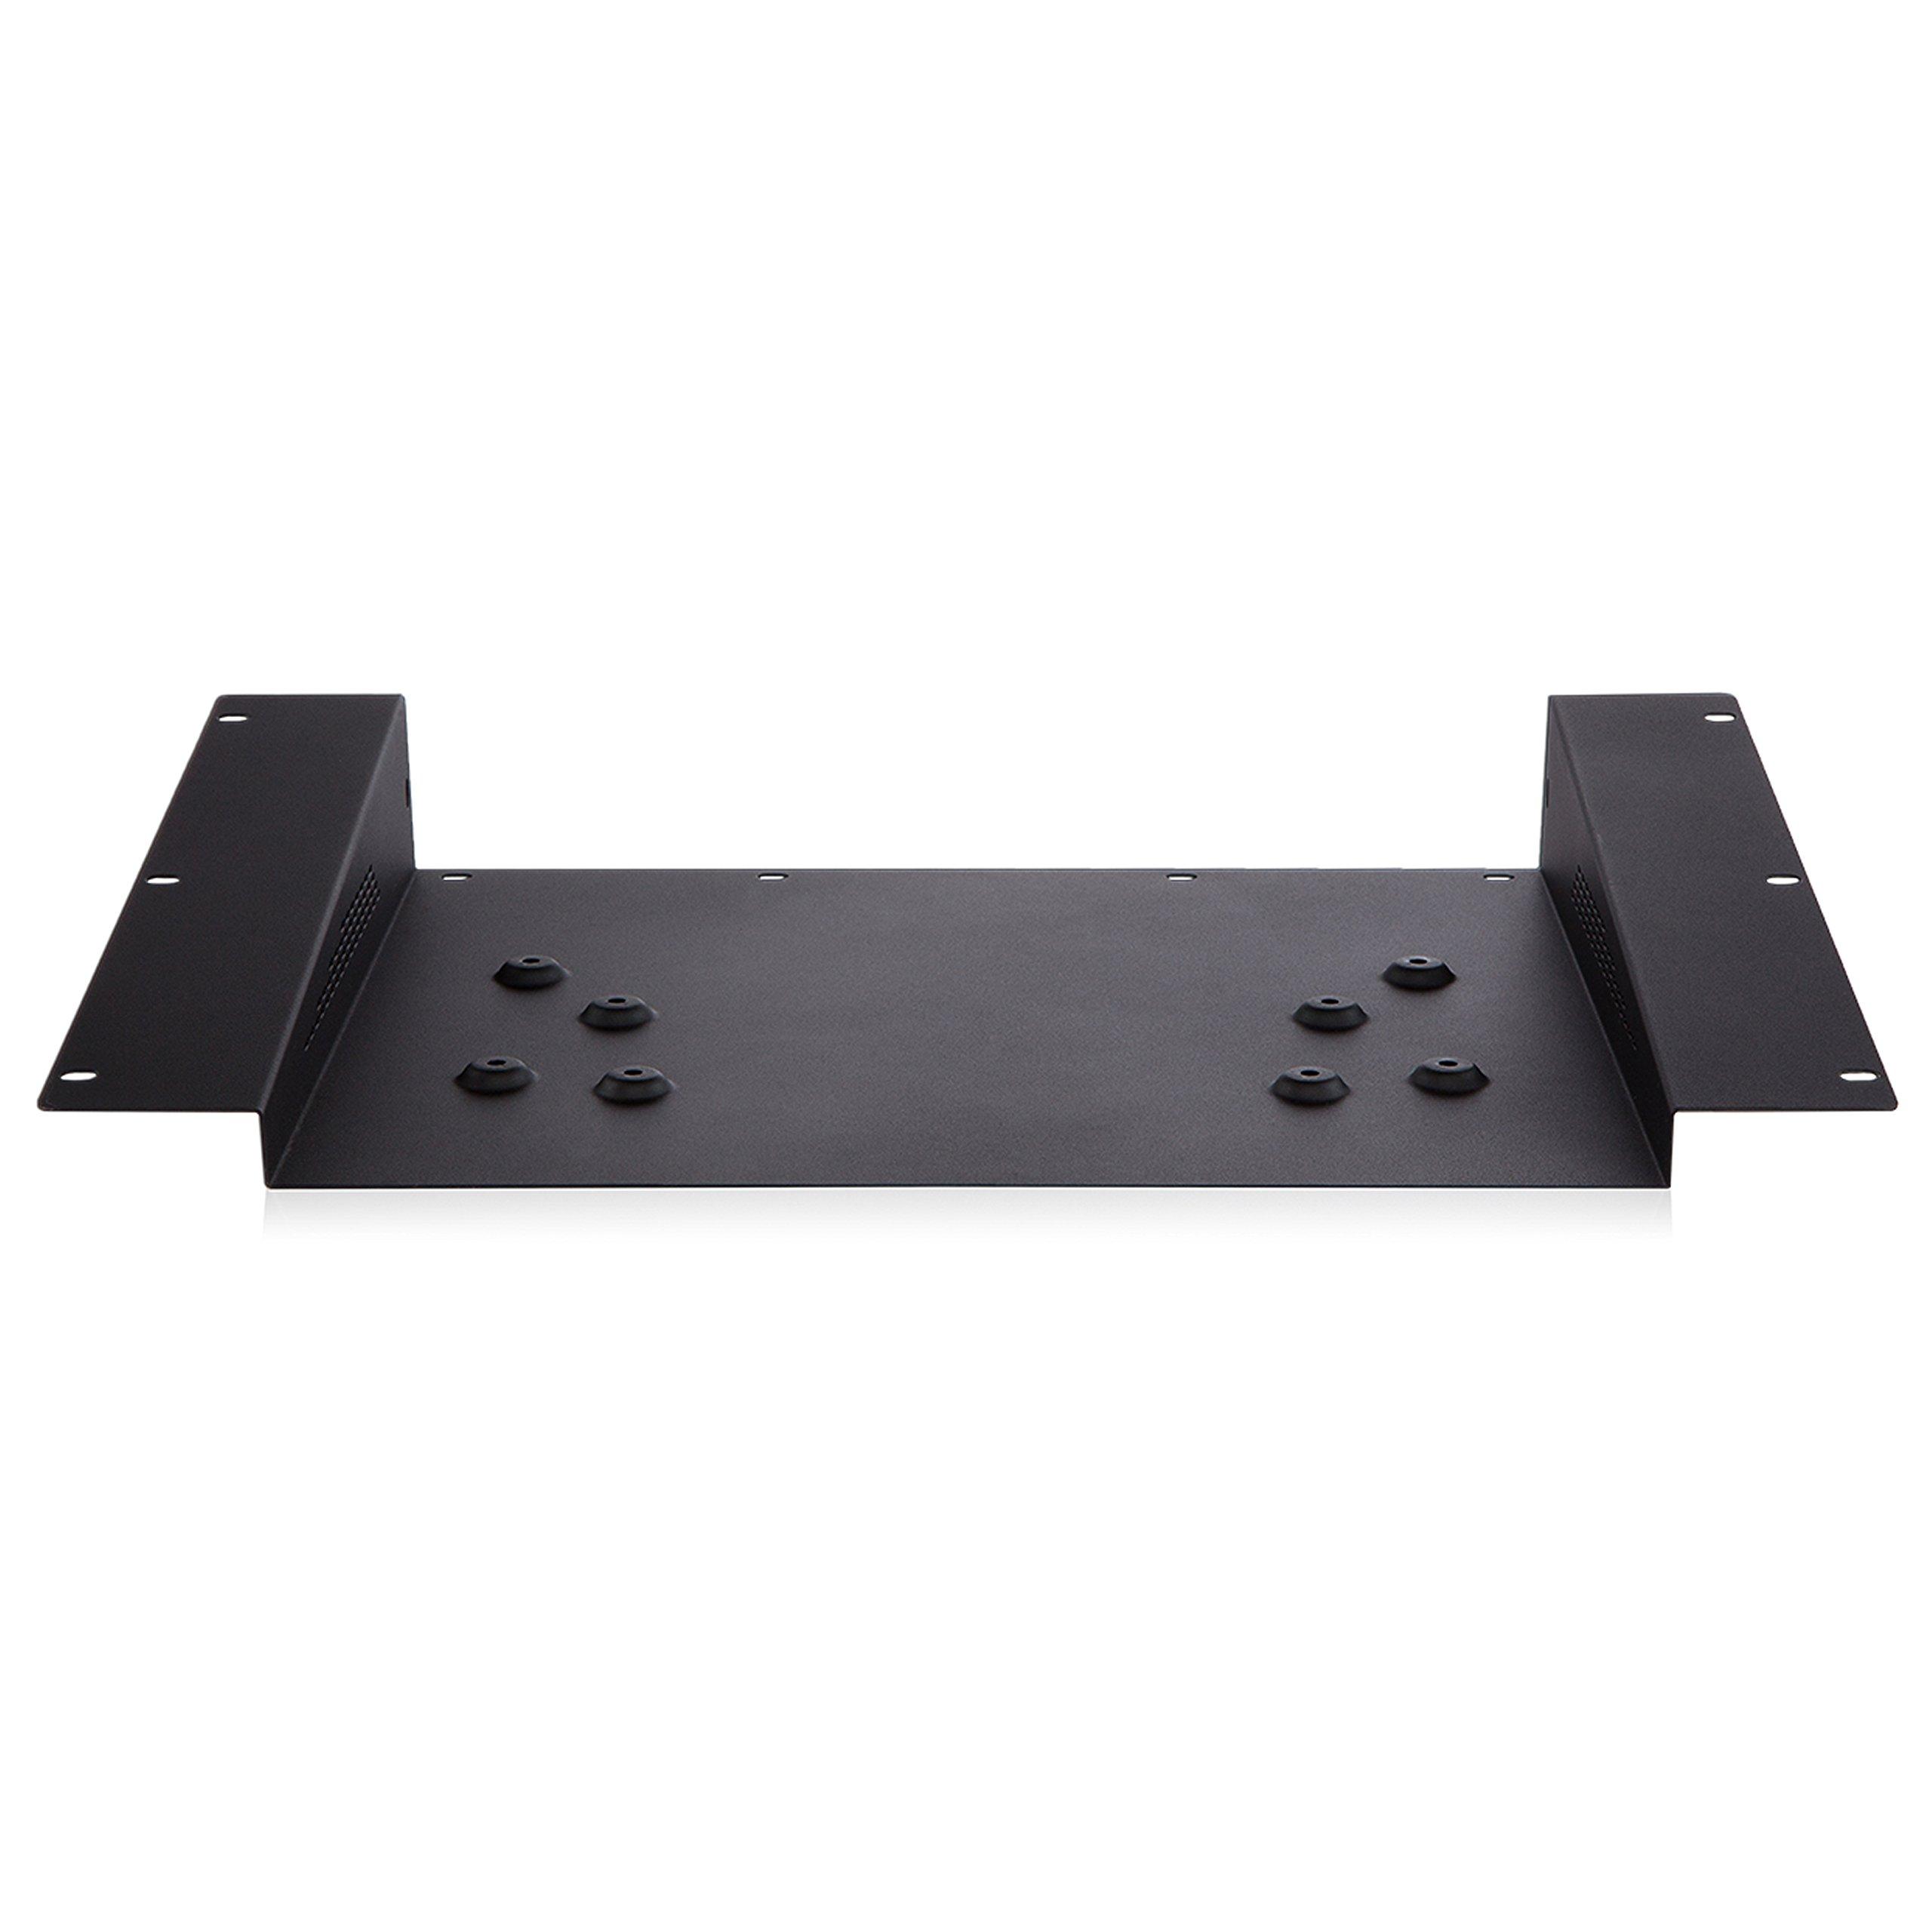 QSC Touchmix Rack Mounting Kit, Black (TMR-01) by QSC